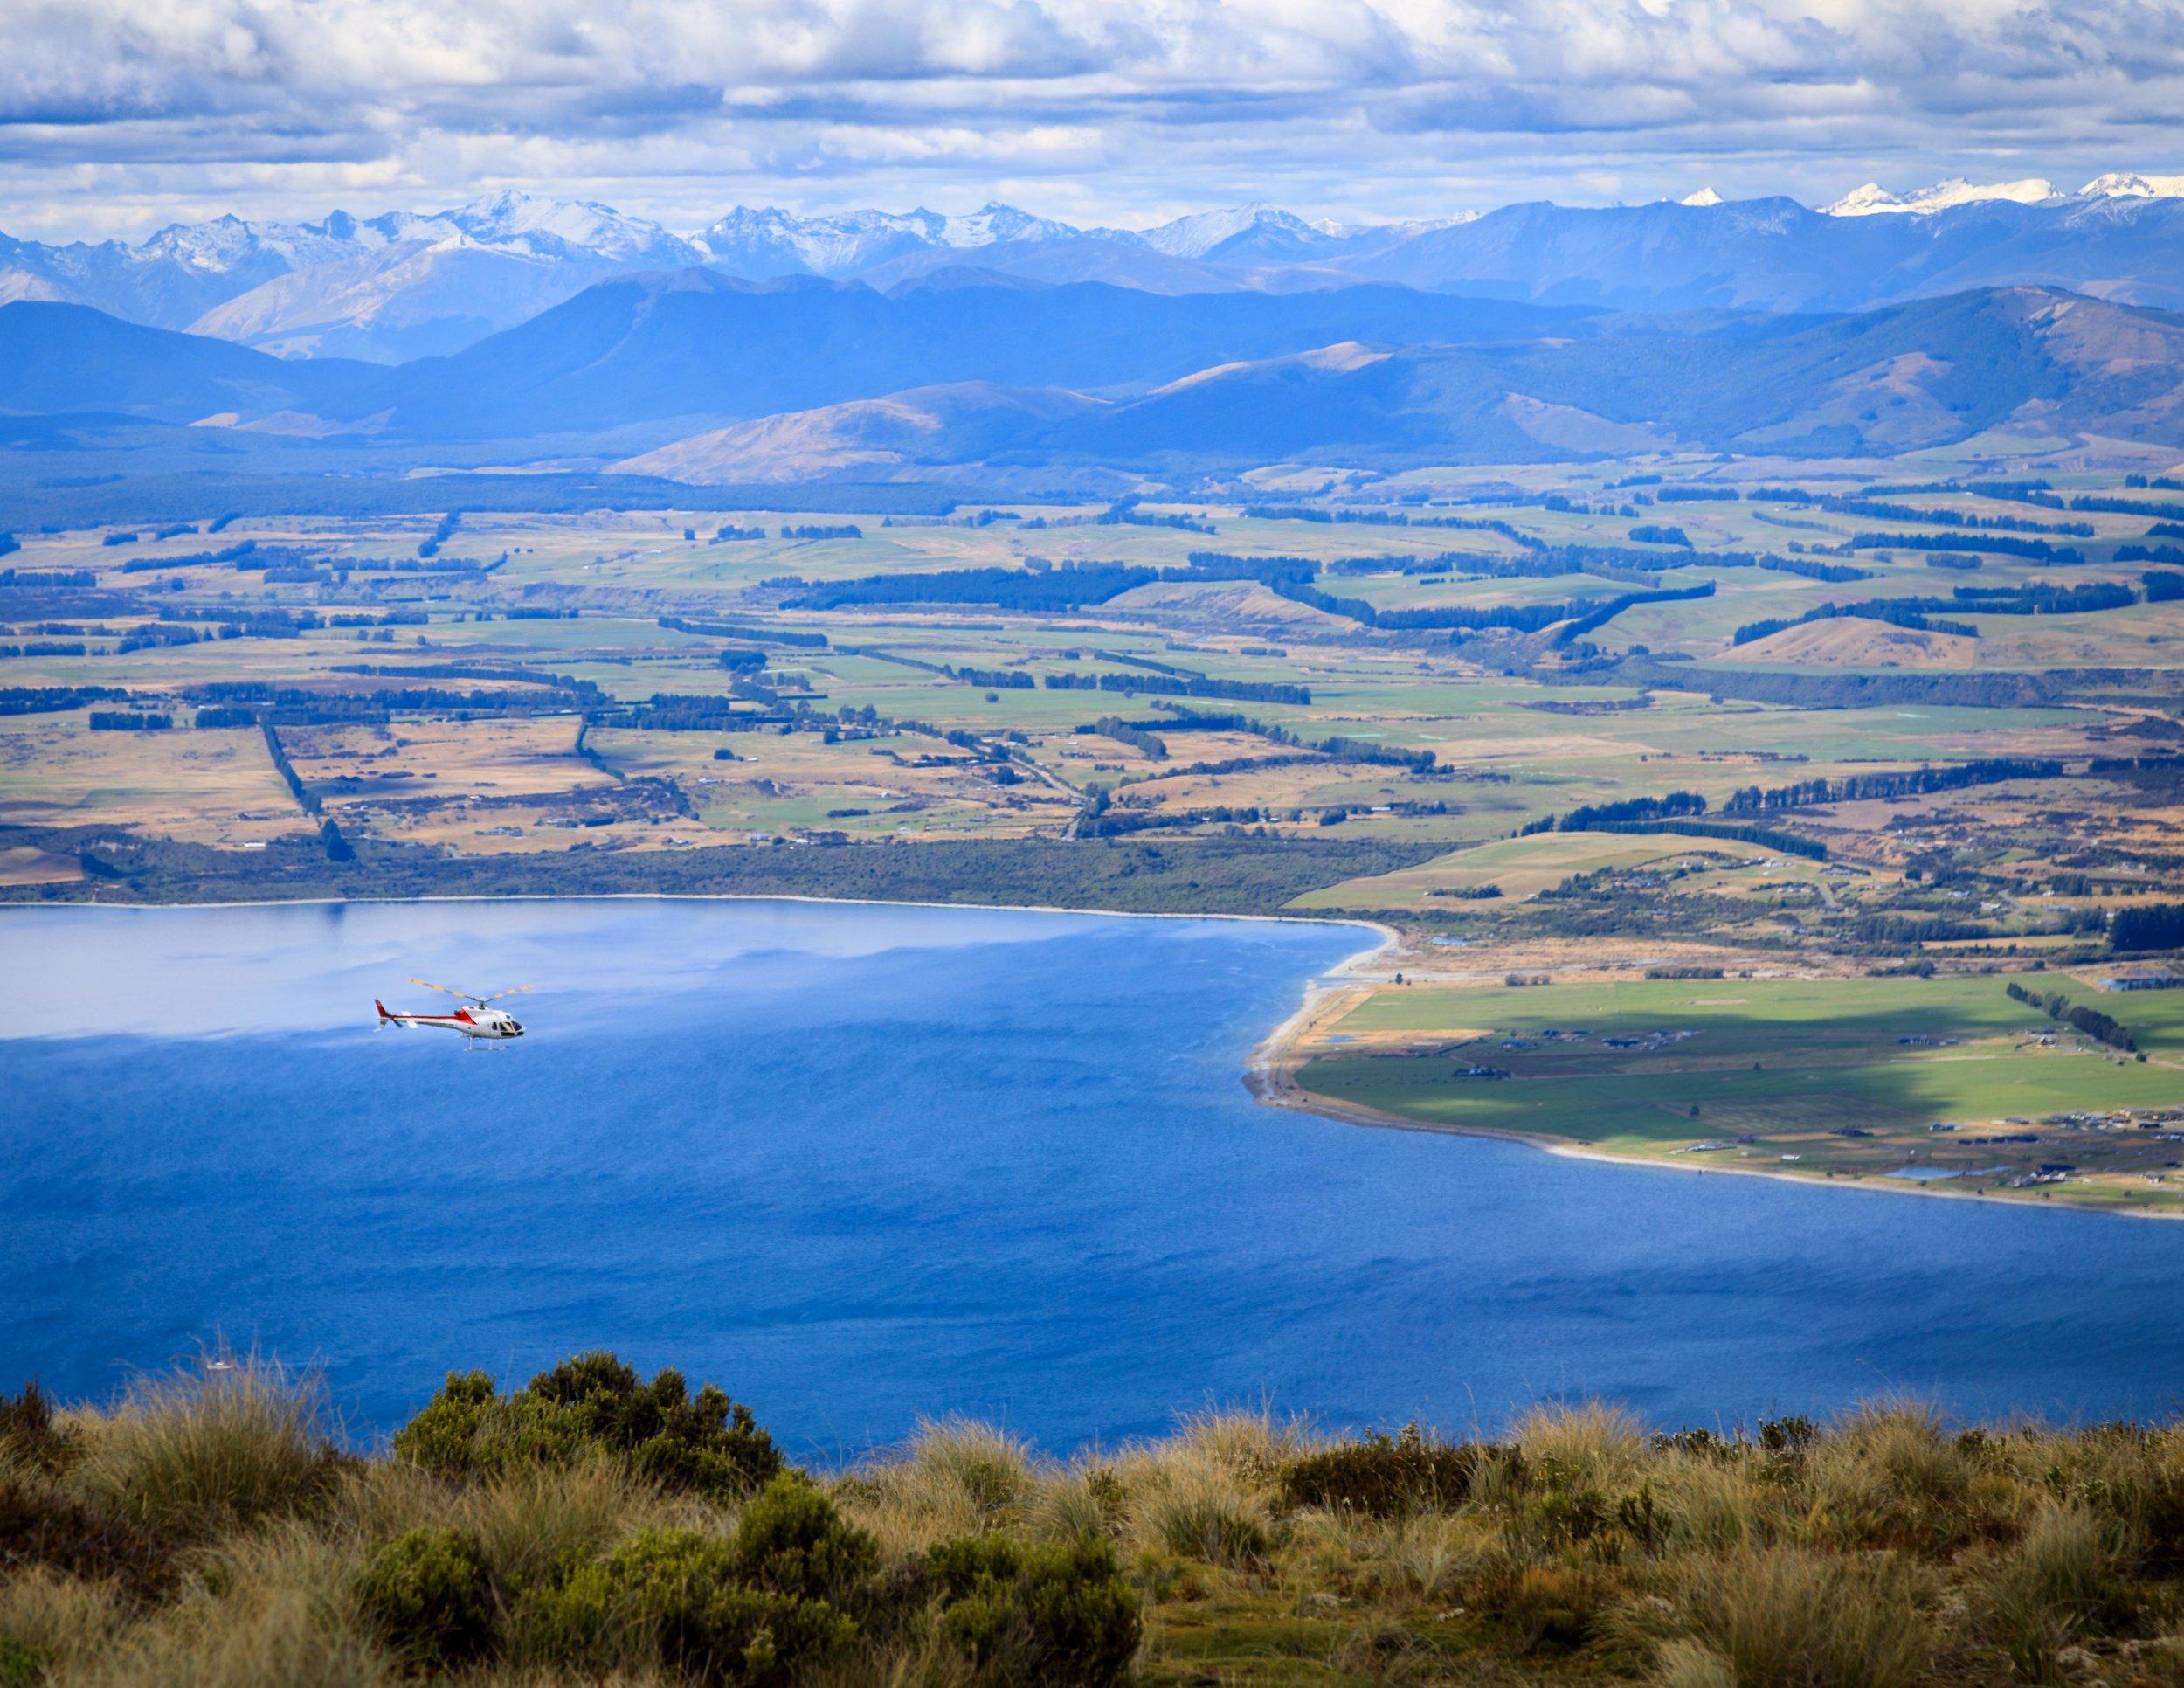 Helicopter over Lake Te Anau